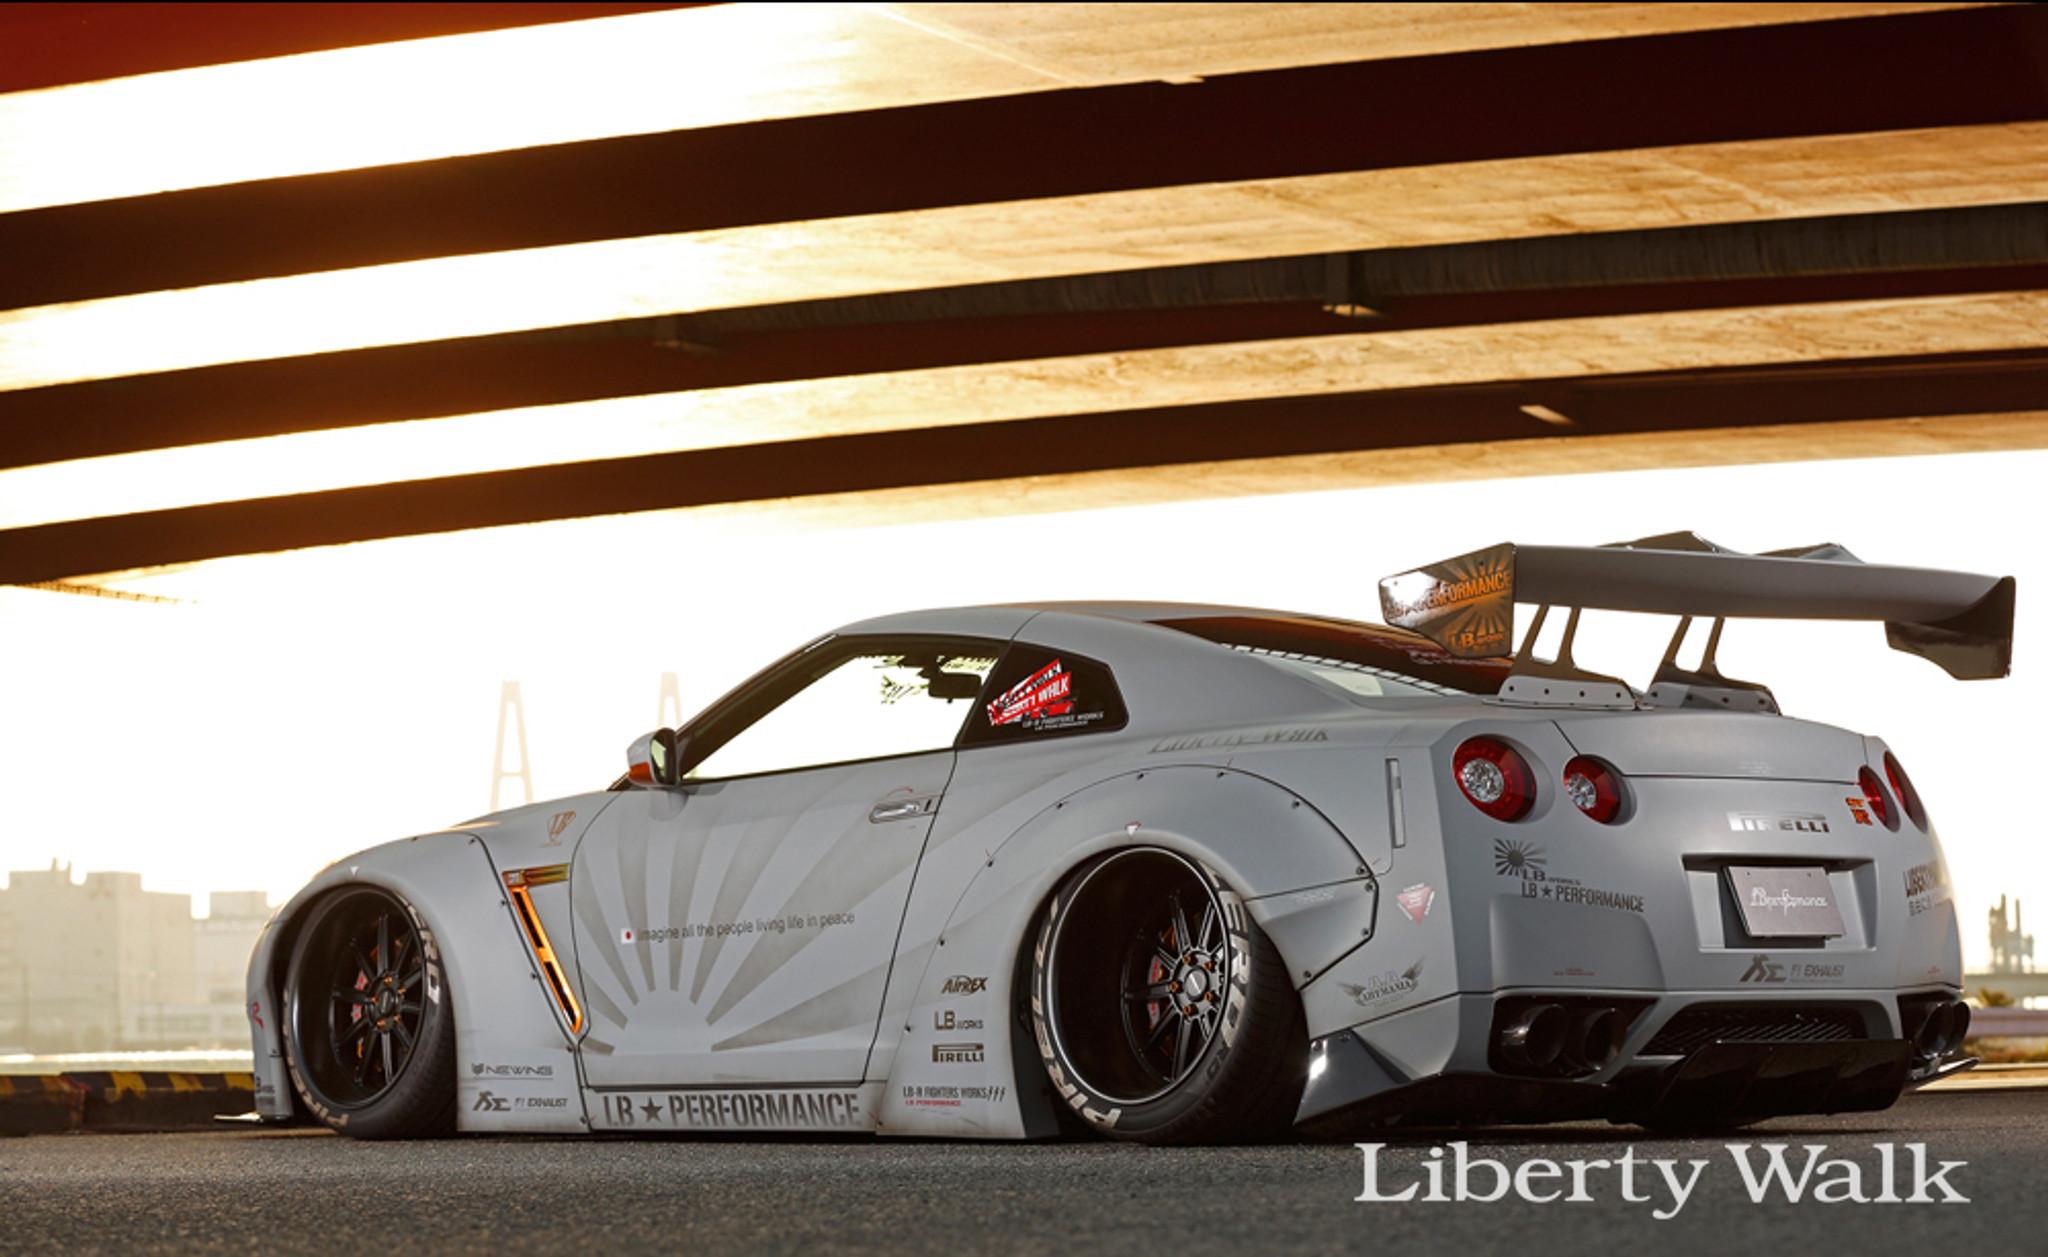 Nissan Skyline R35 Gtr Liberty Walk Body Kit Ver 2 Meduza Design Ltd